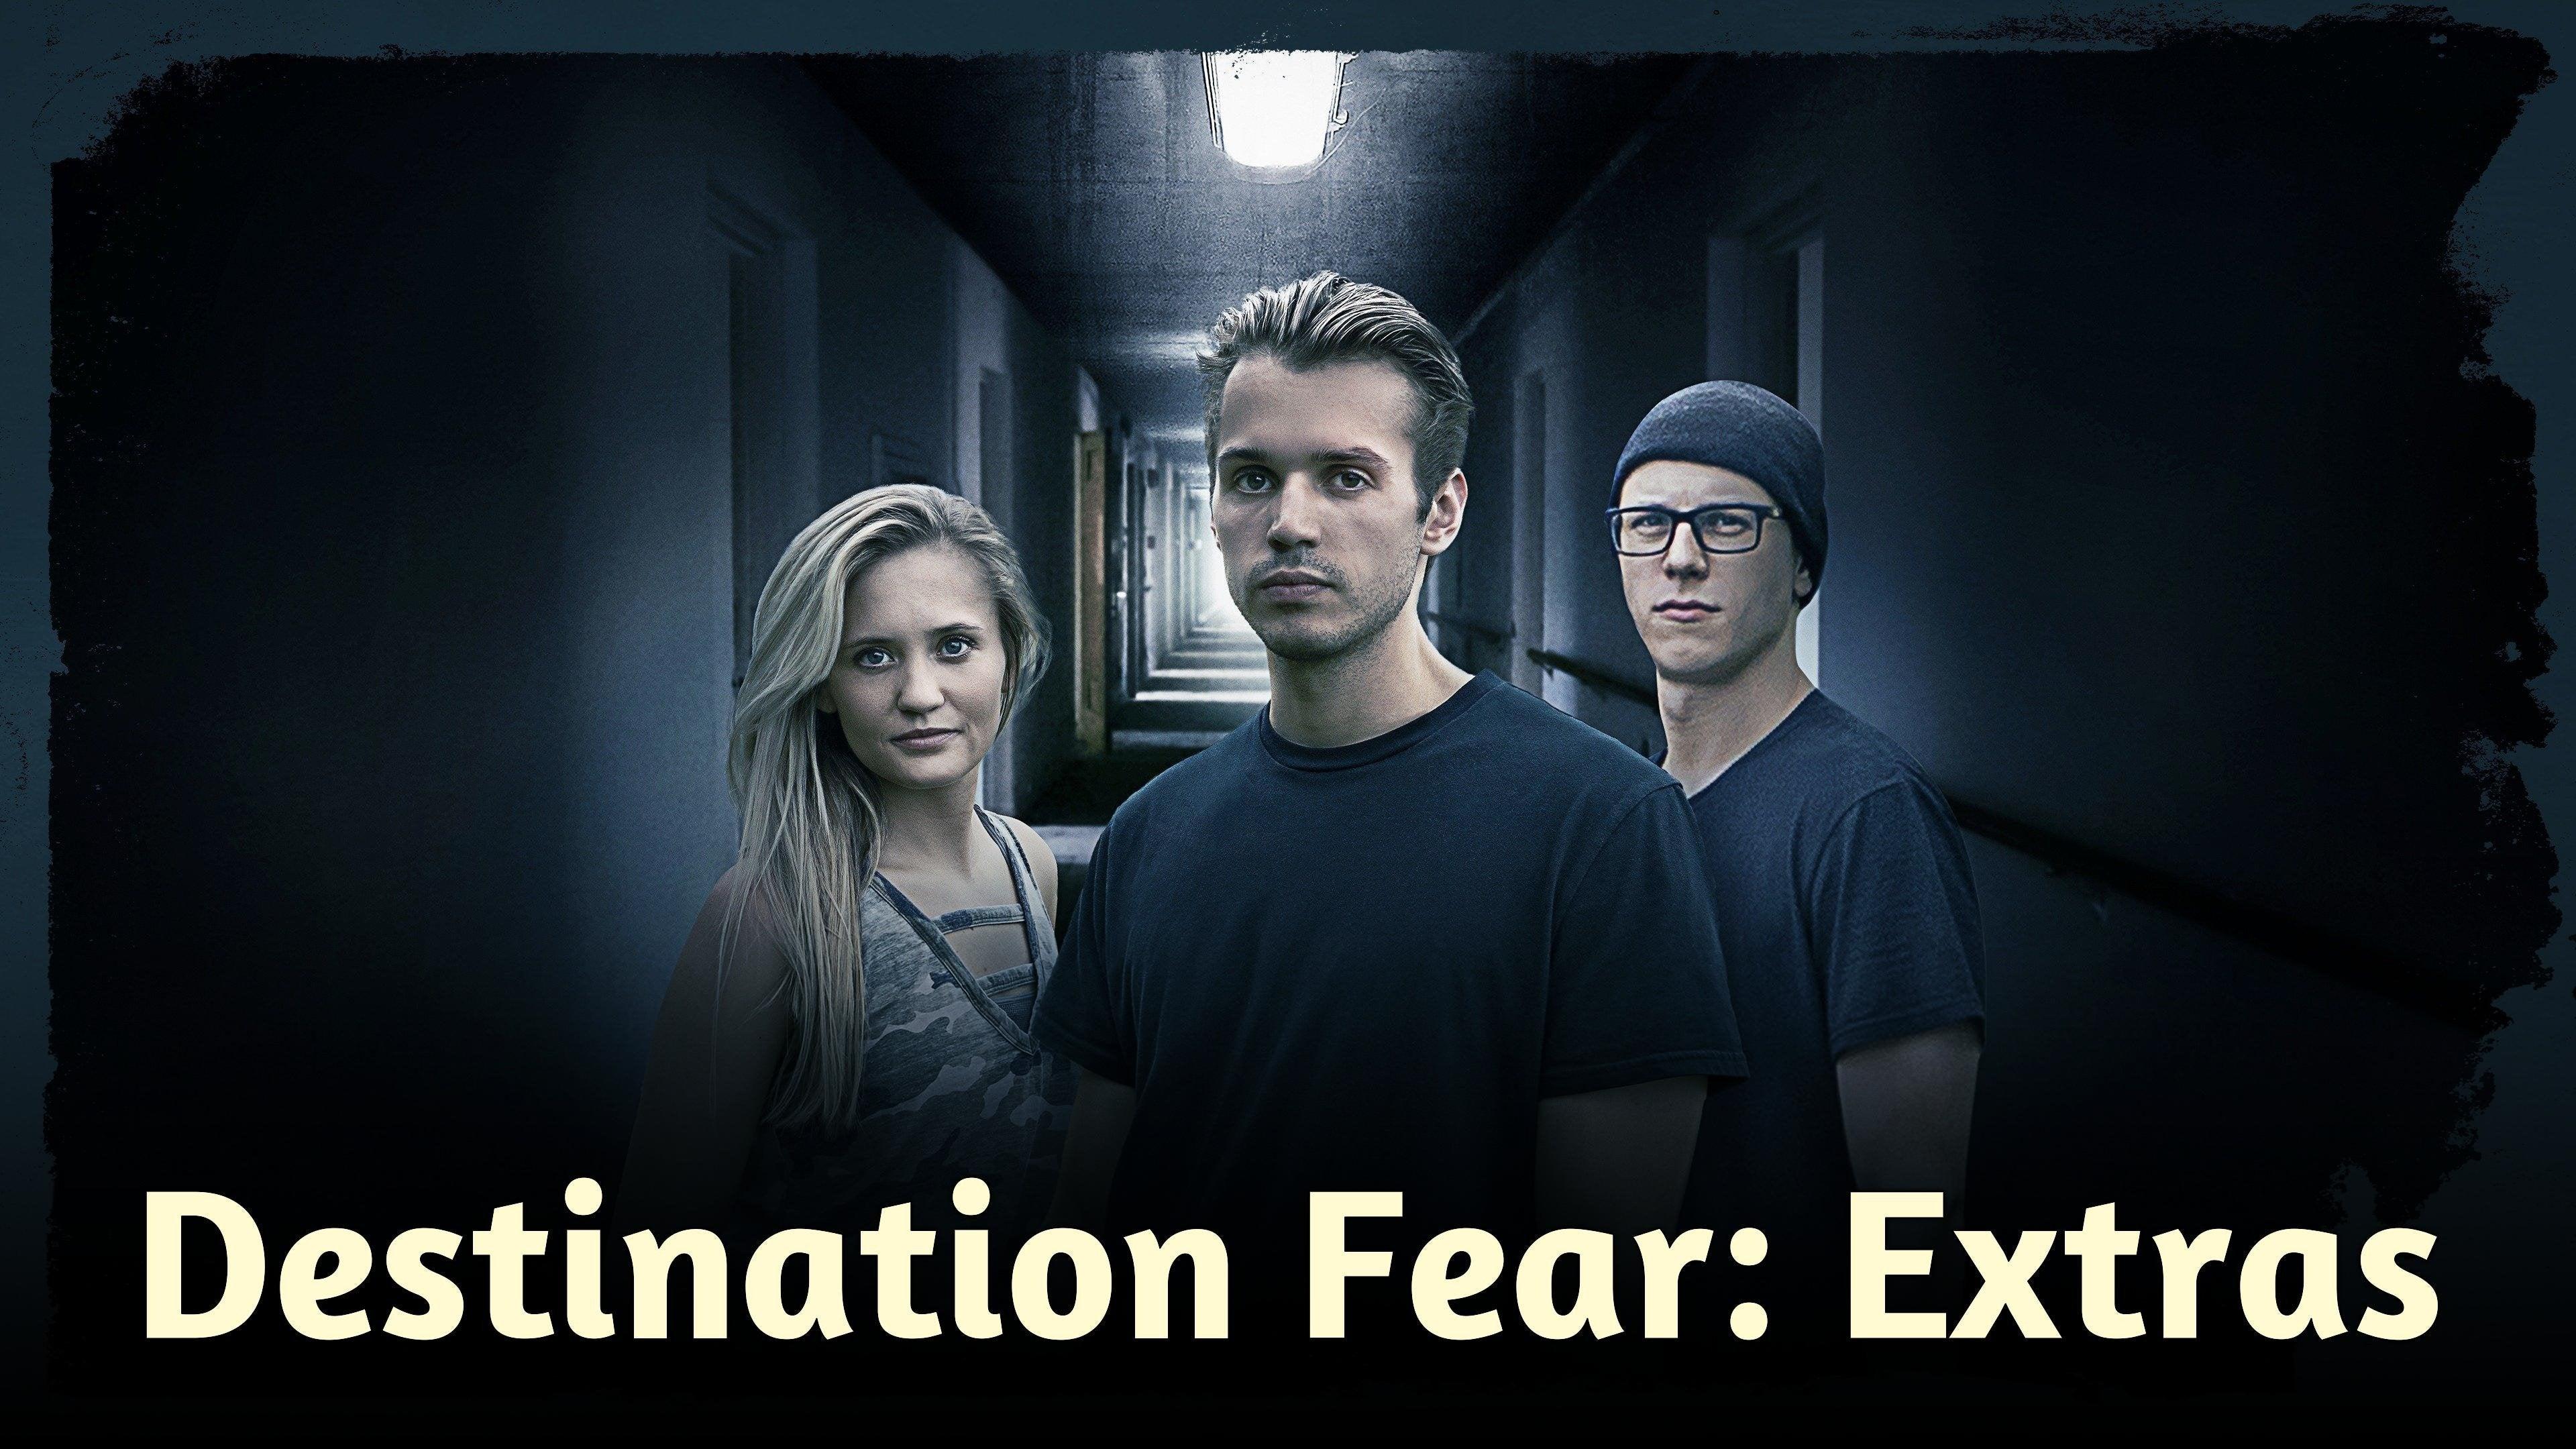 Destination Fear: Extras